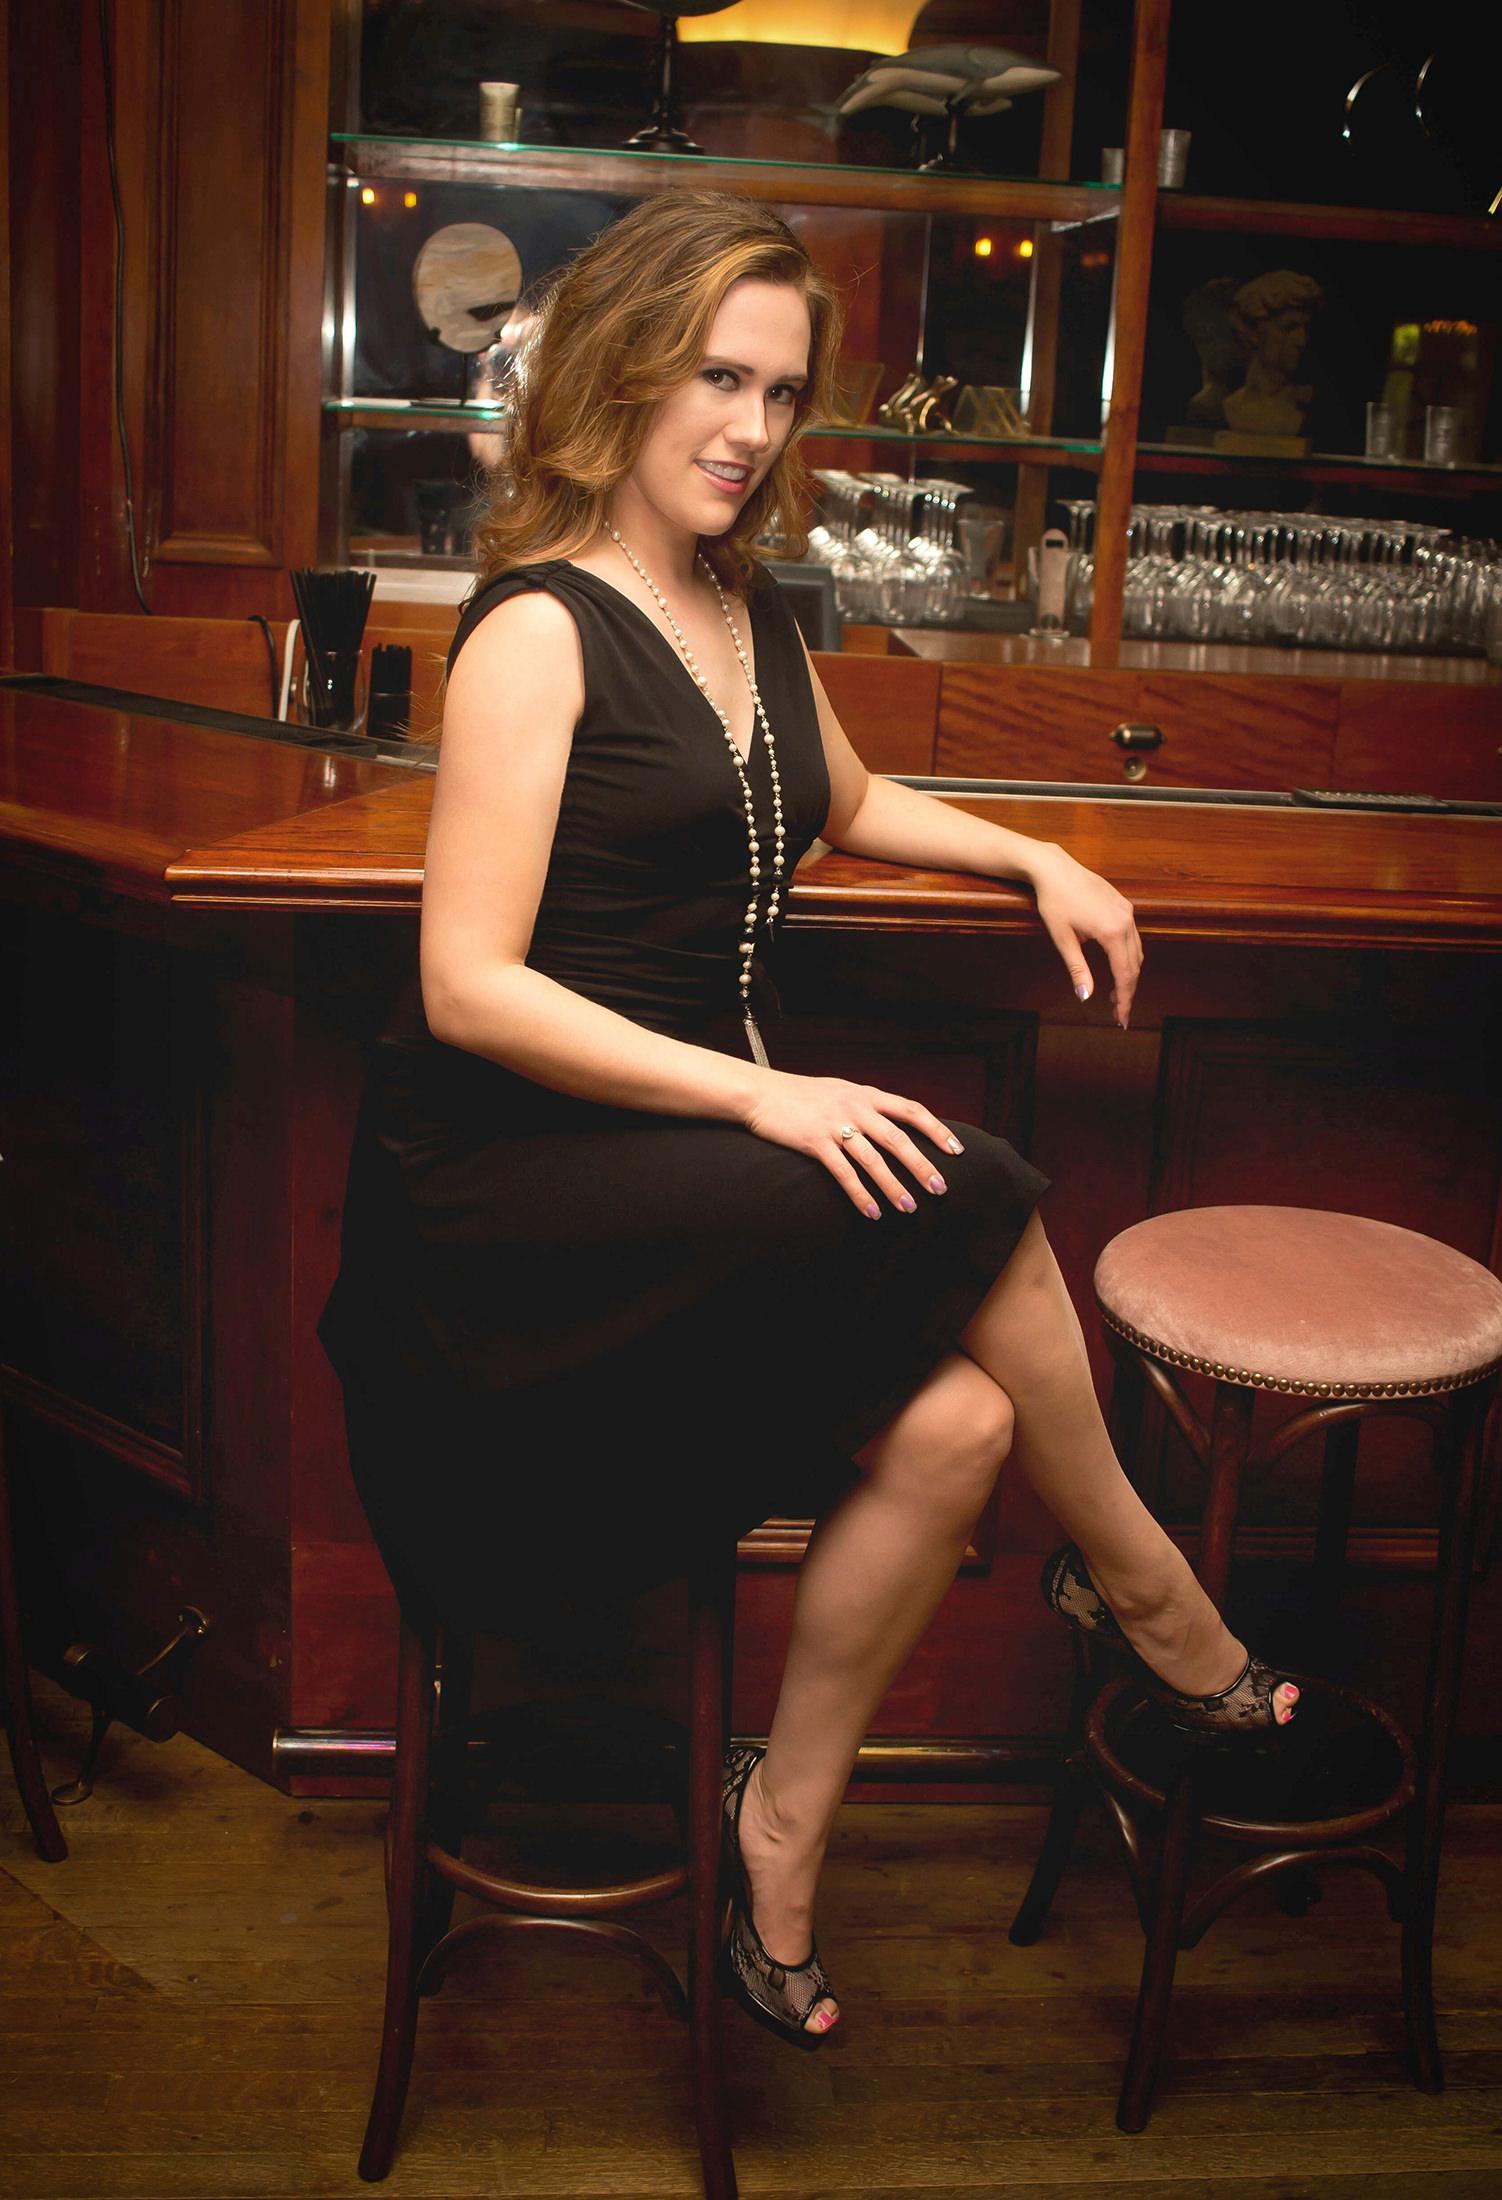 Seattle's Best - Sorrento Hotel - Katherine Chloe Cahoon B